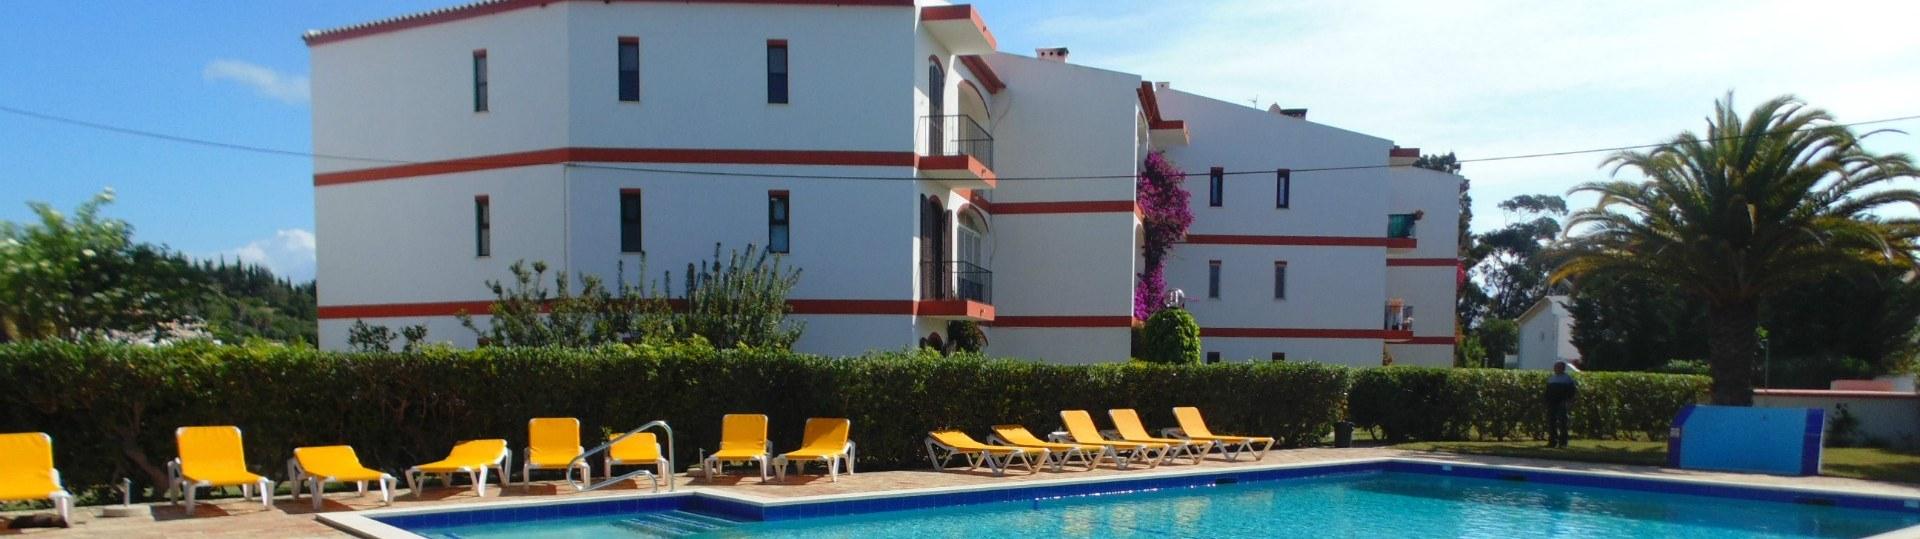 Appartement in de Algarve